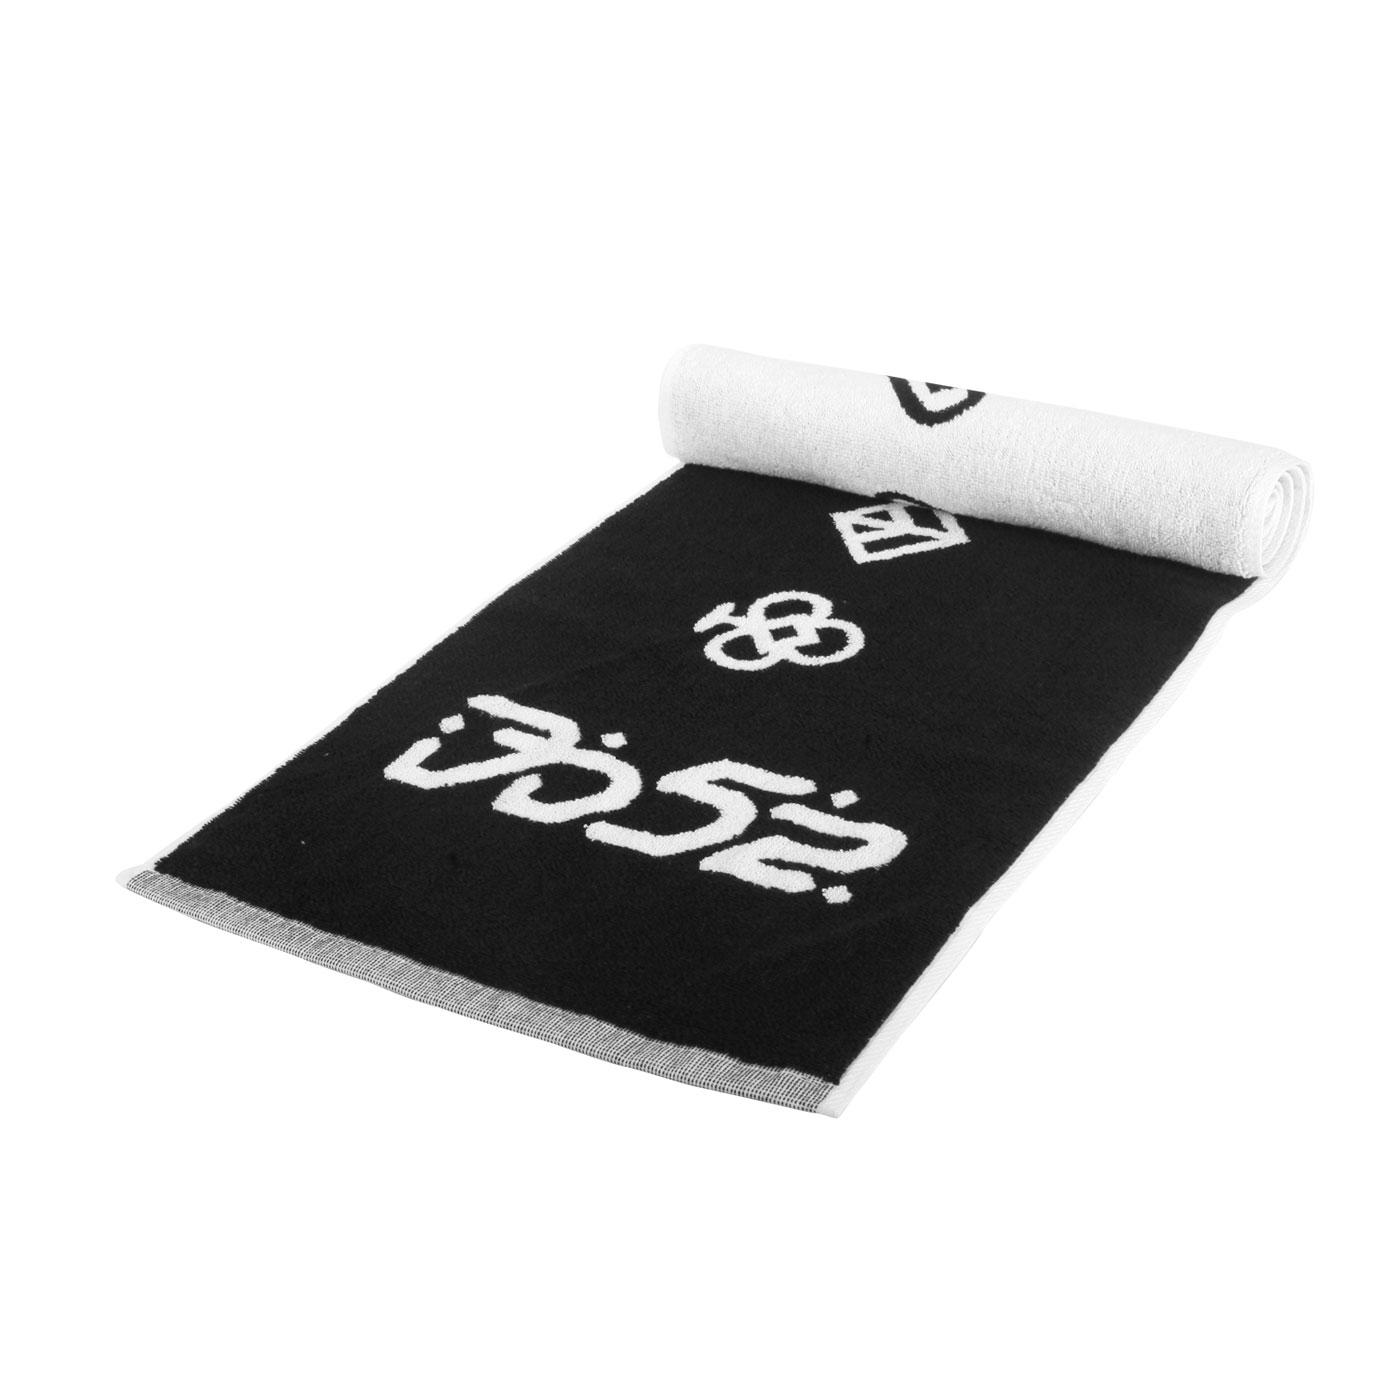 KAPPA DD52聯名毛巾 37137ZW-005 - 黑白